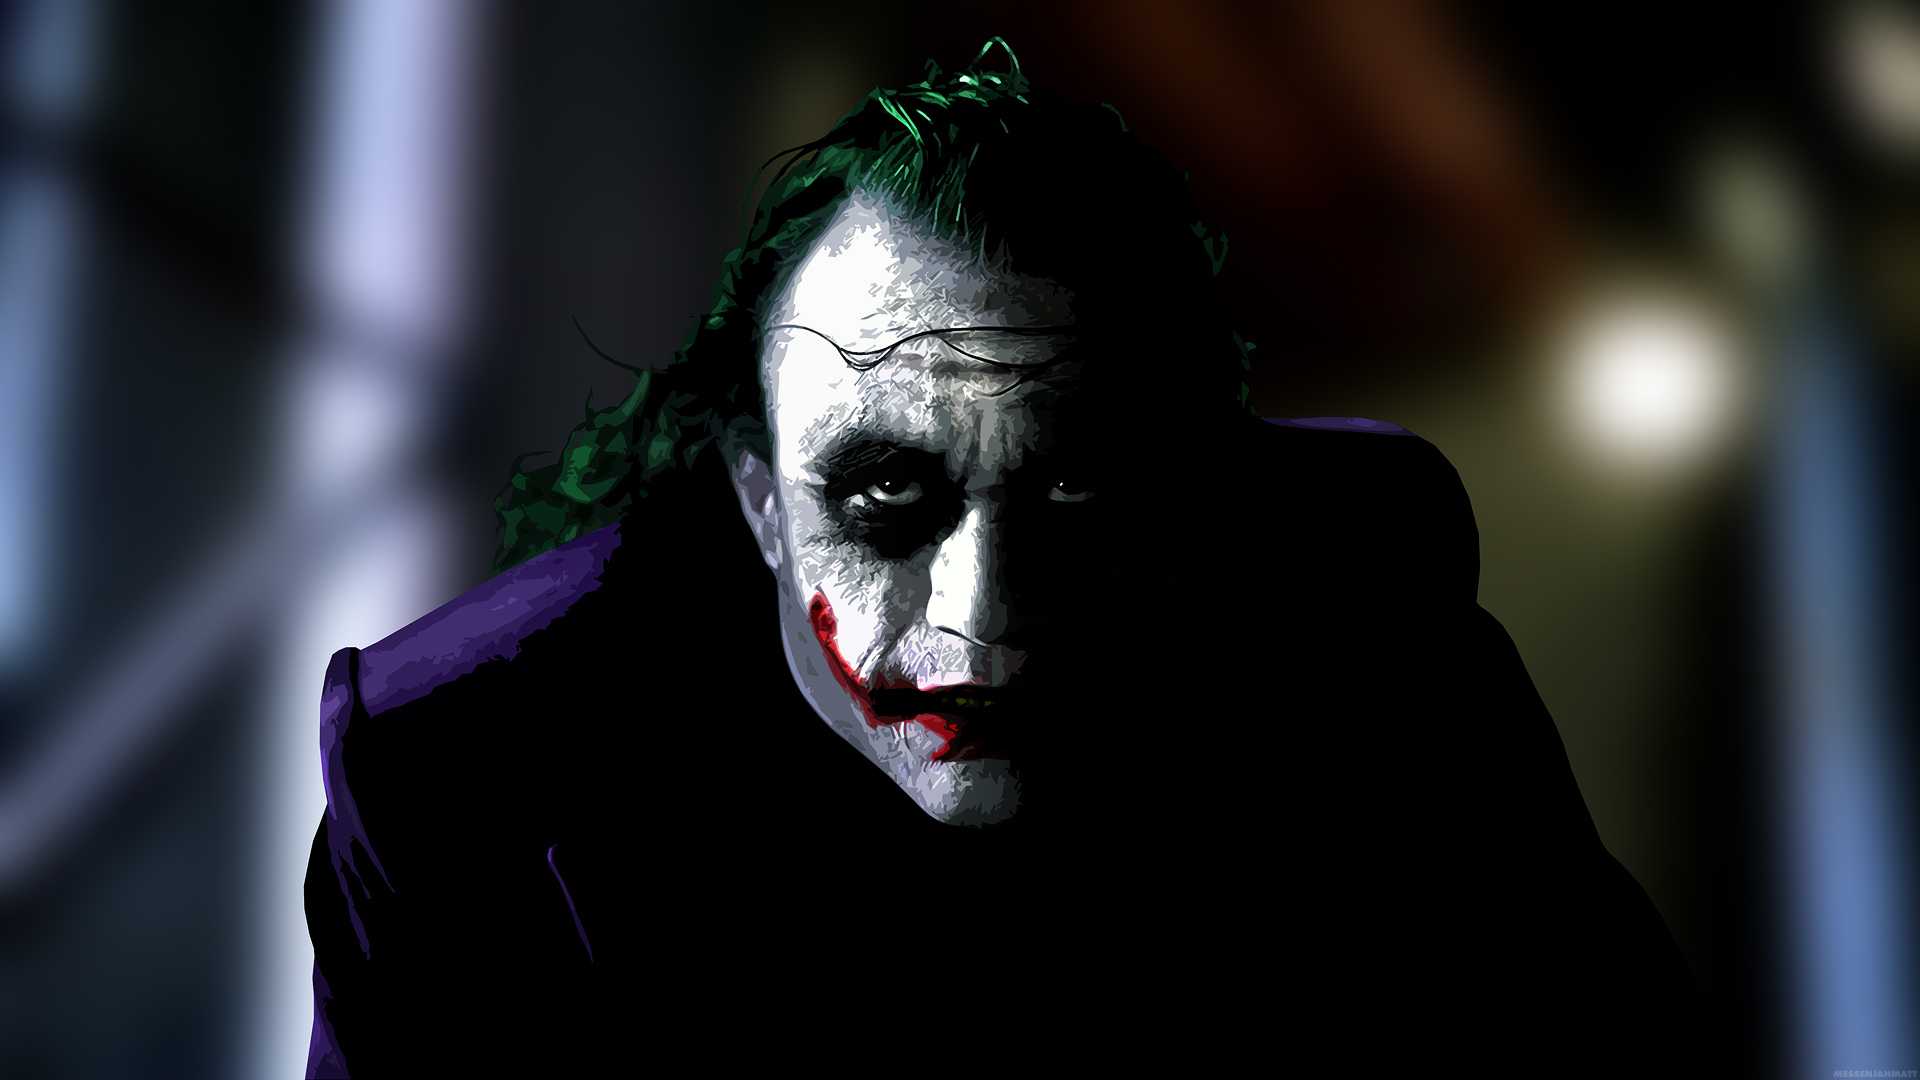 The Joker Full Hd Wallpaper High Resolution Jokers Hd 1920x1080 Wallpaper Teahub Io